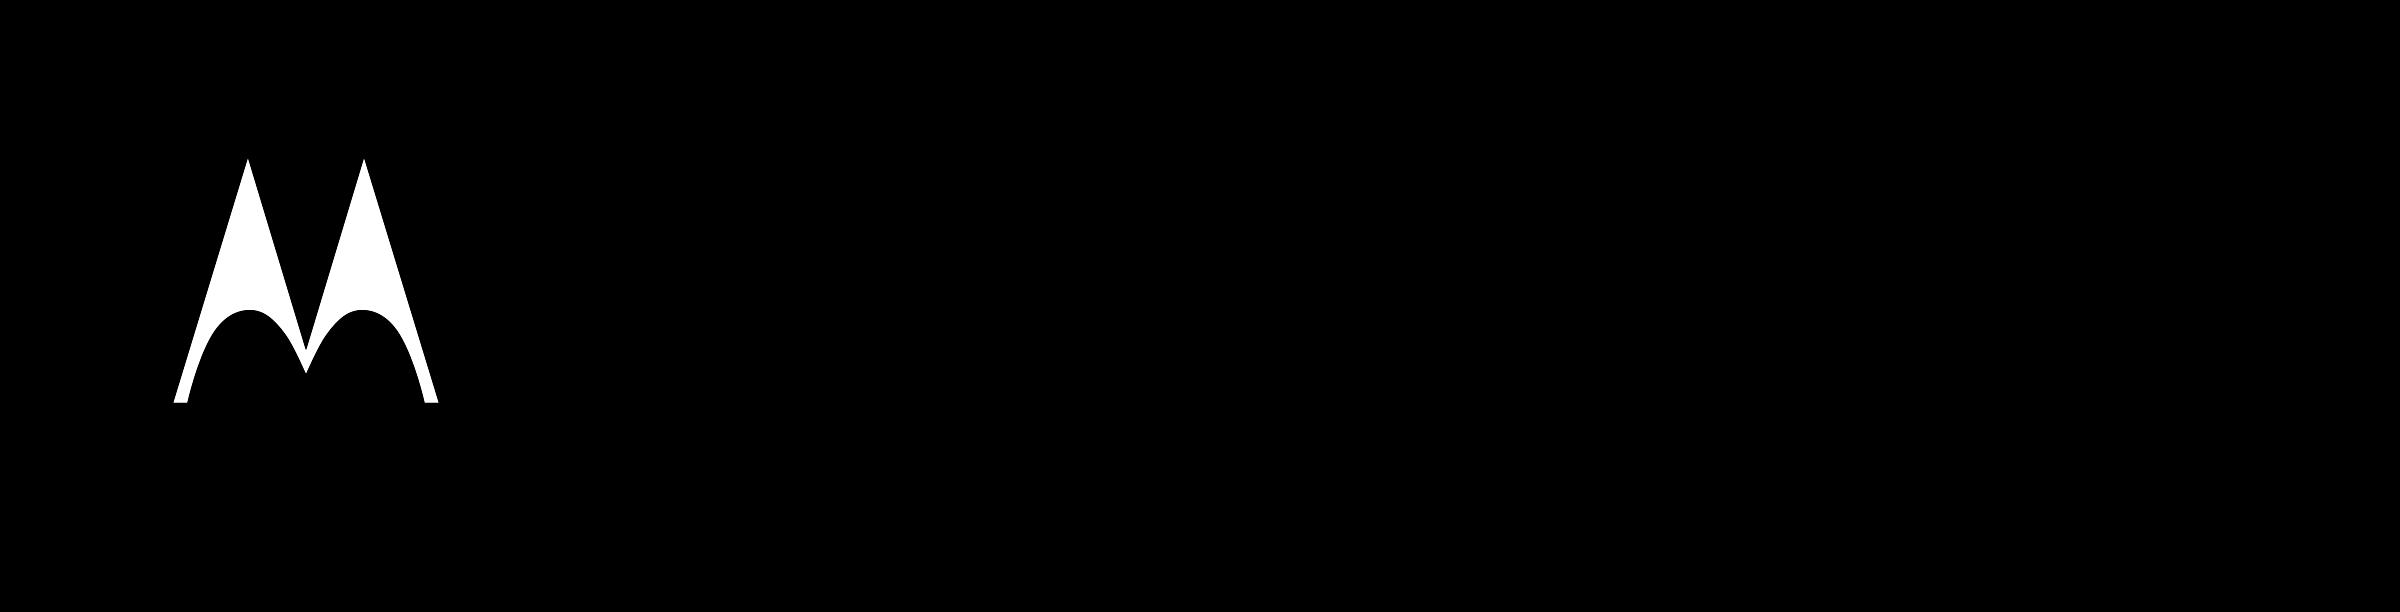 Motorola-logo-black-and-white